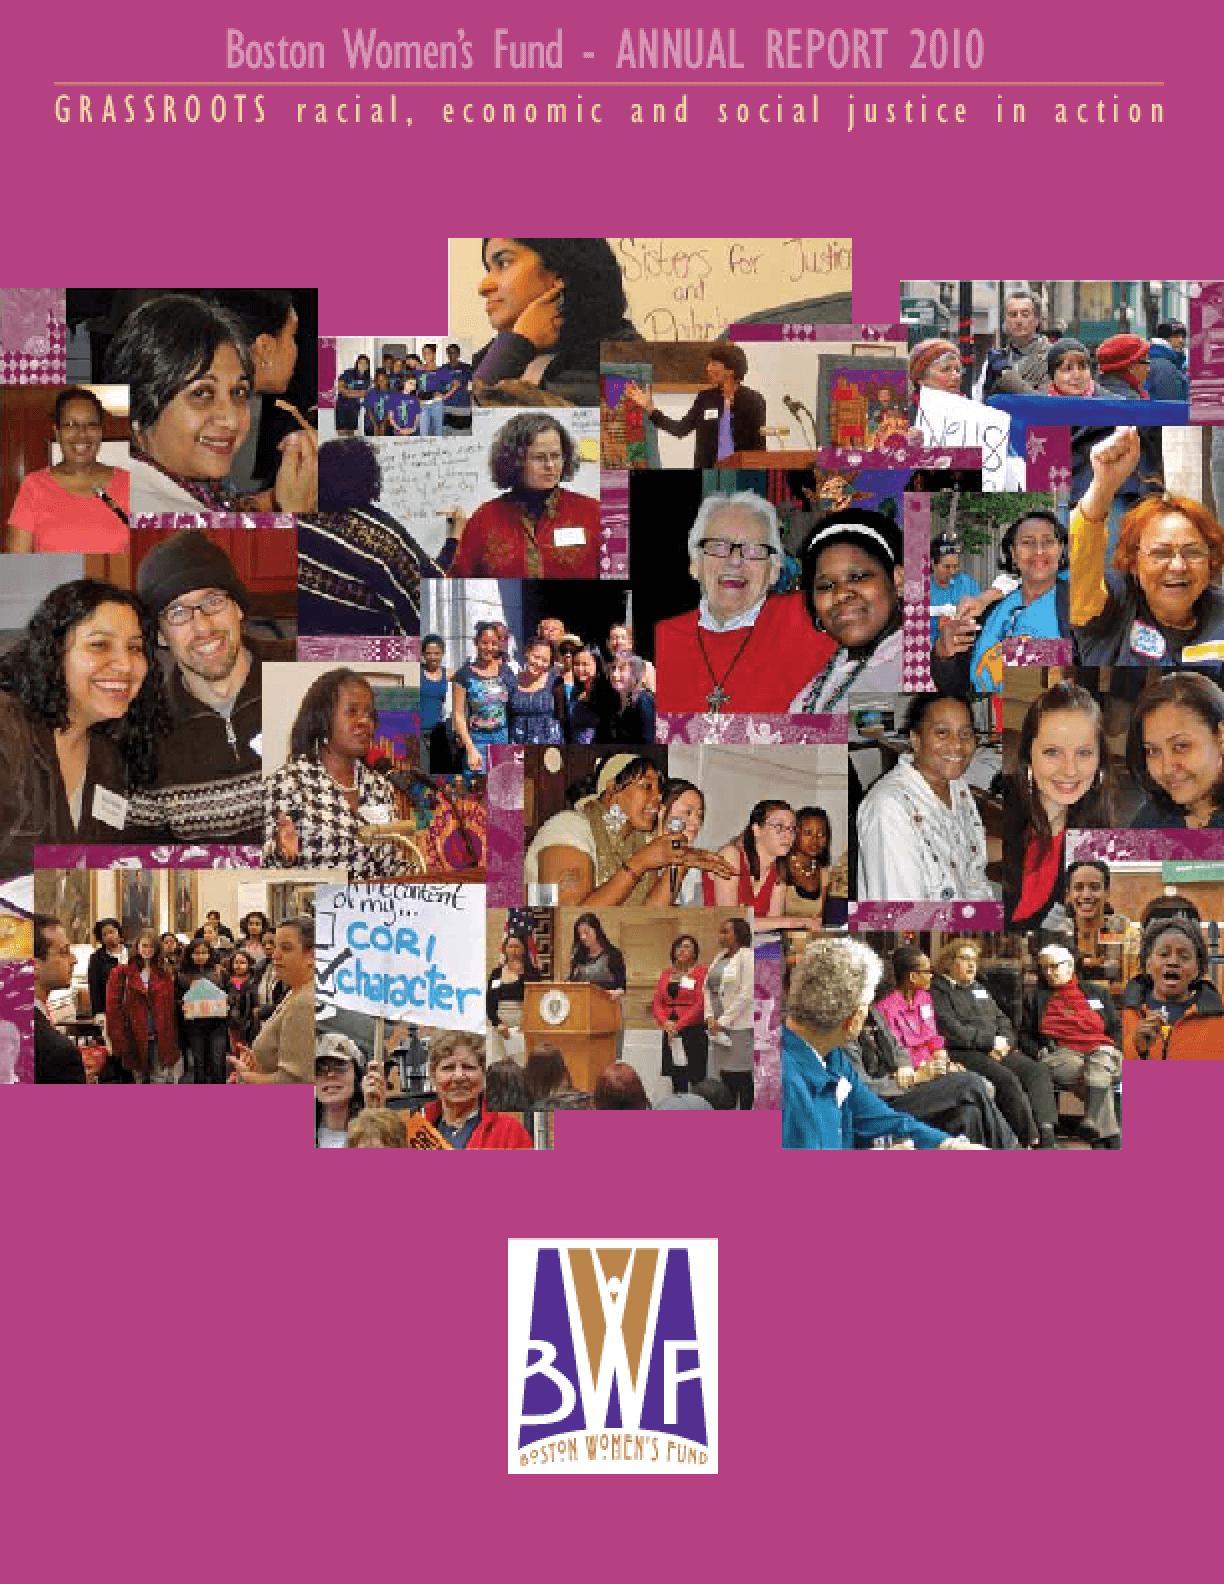 Boston Women's Fund Annual Report FY 2010/11